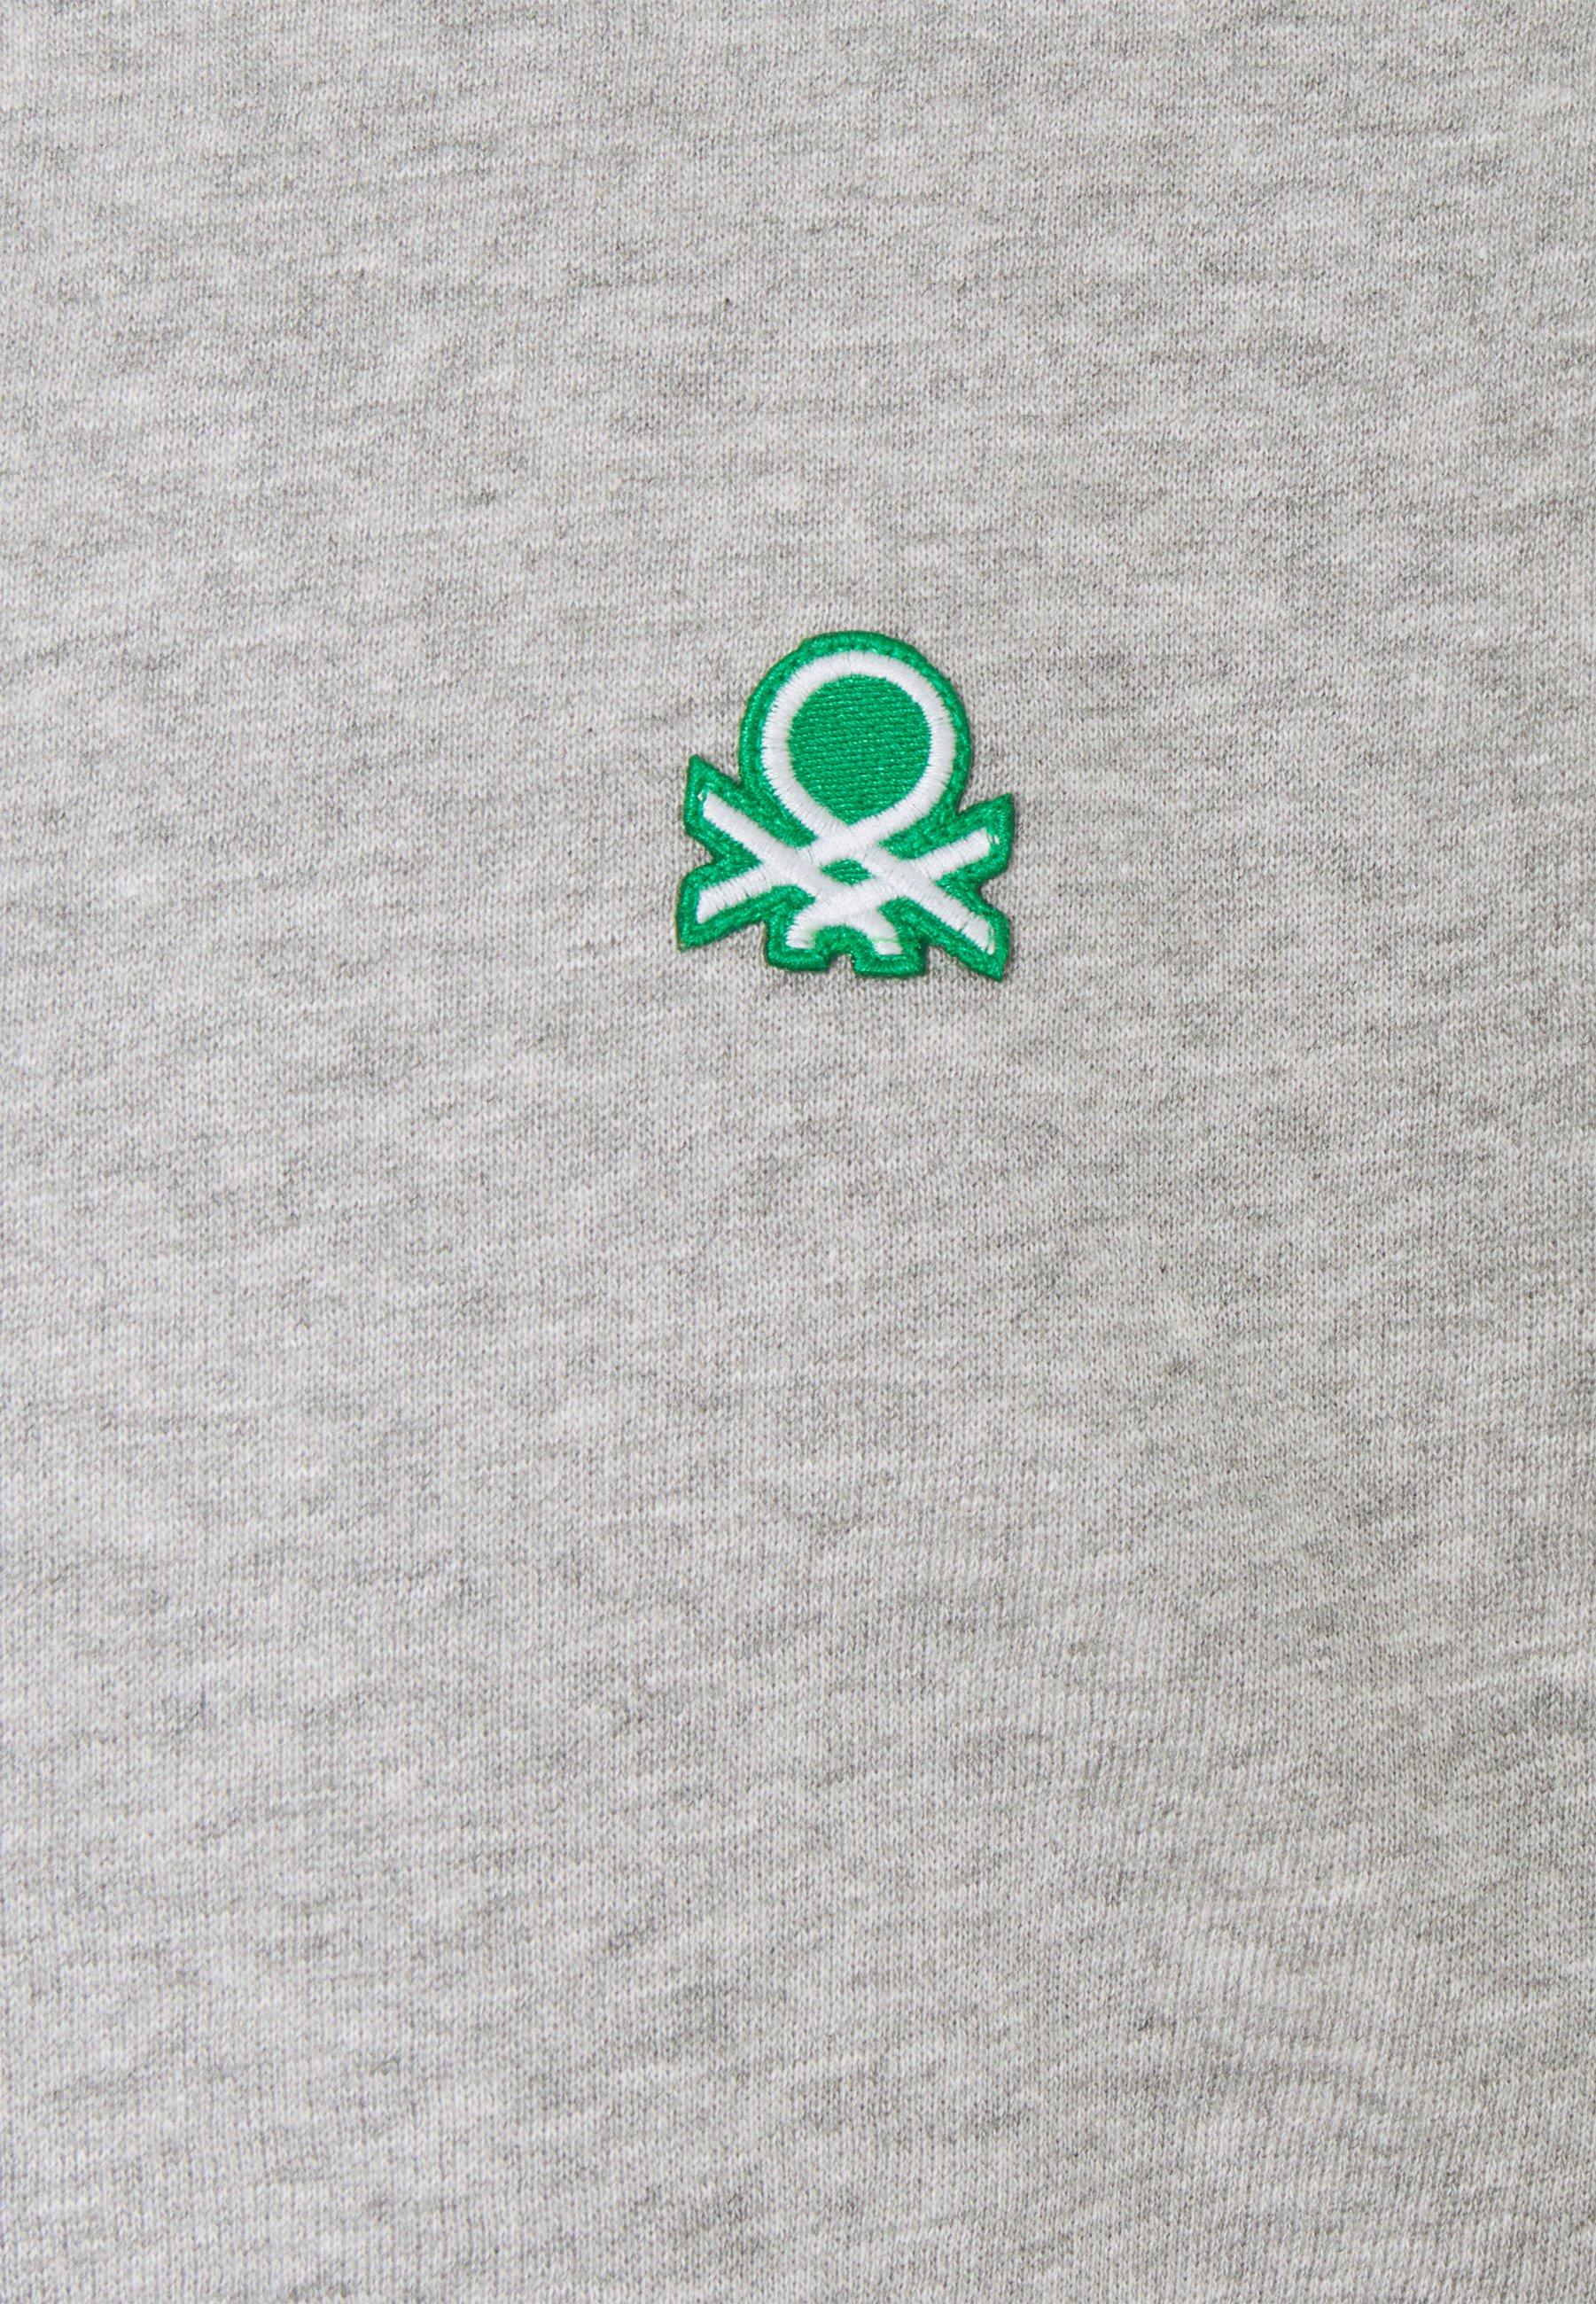 Benetton CREW NECK - Sudadera - light grey J1pbo